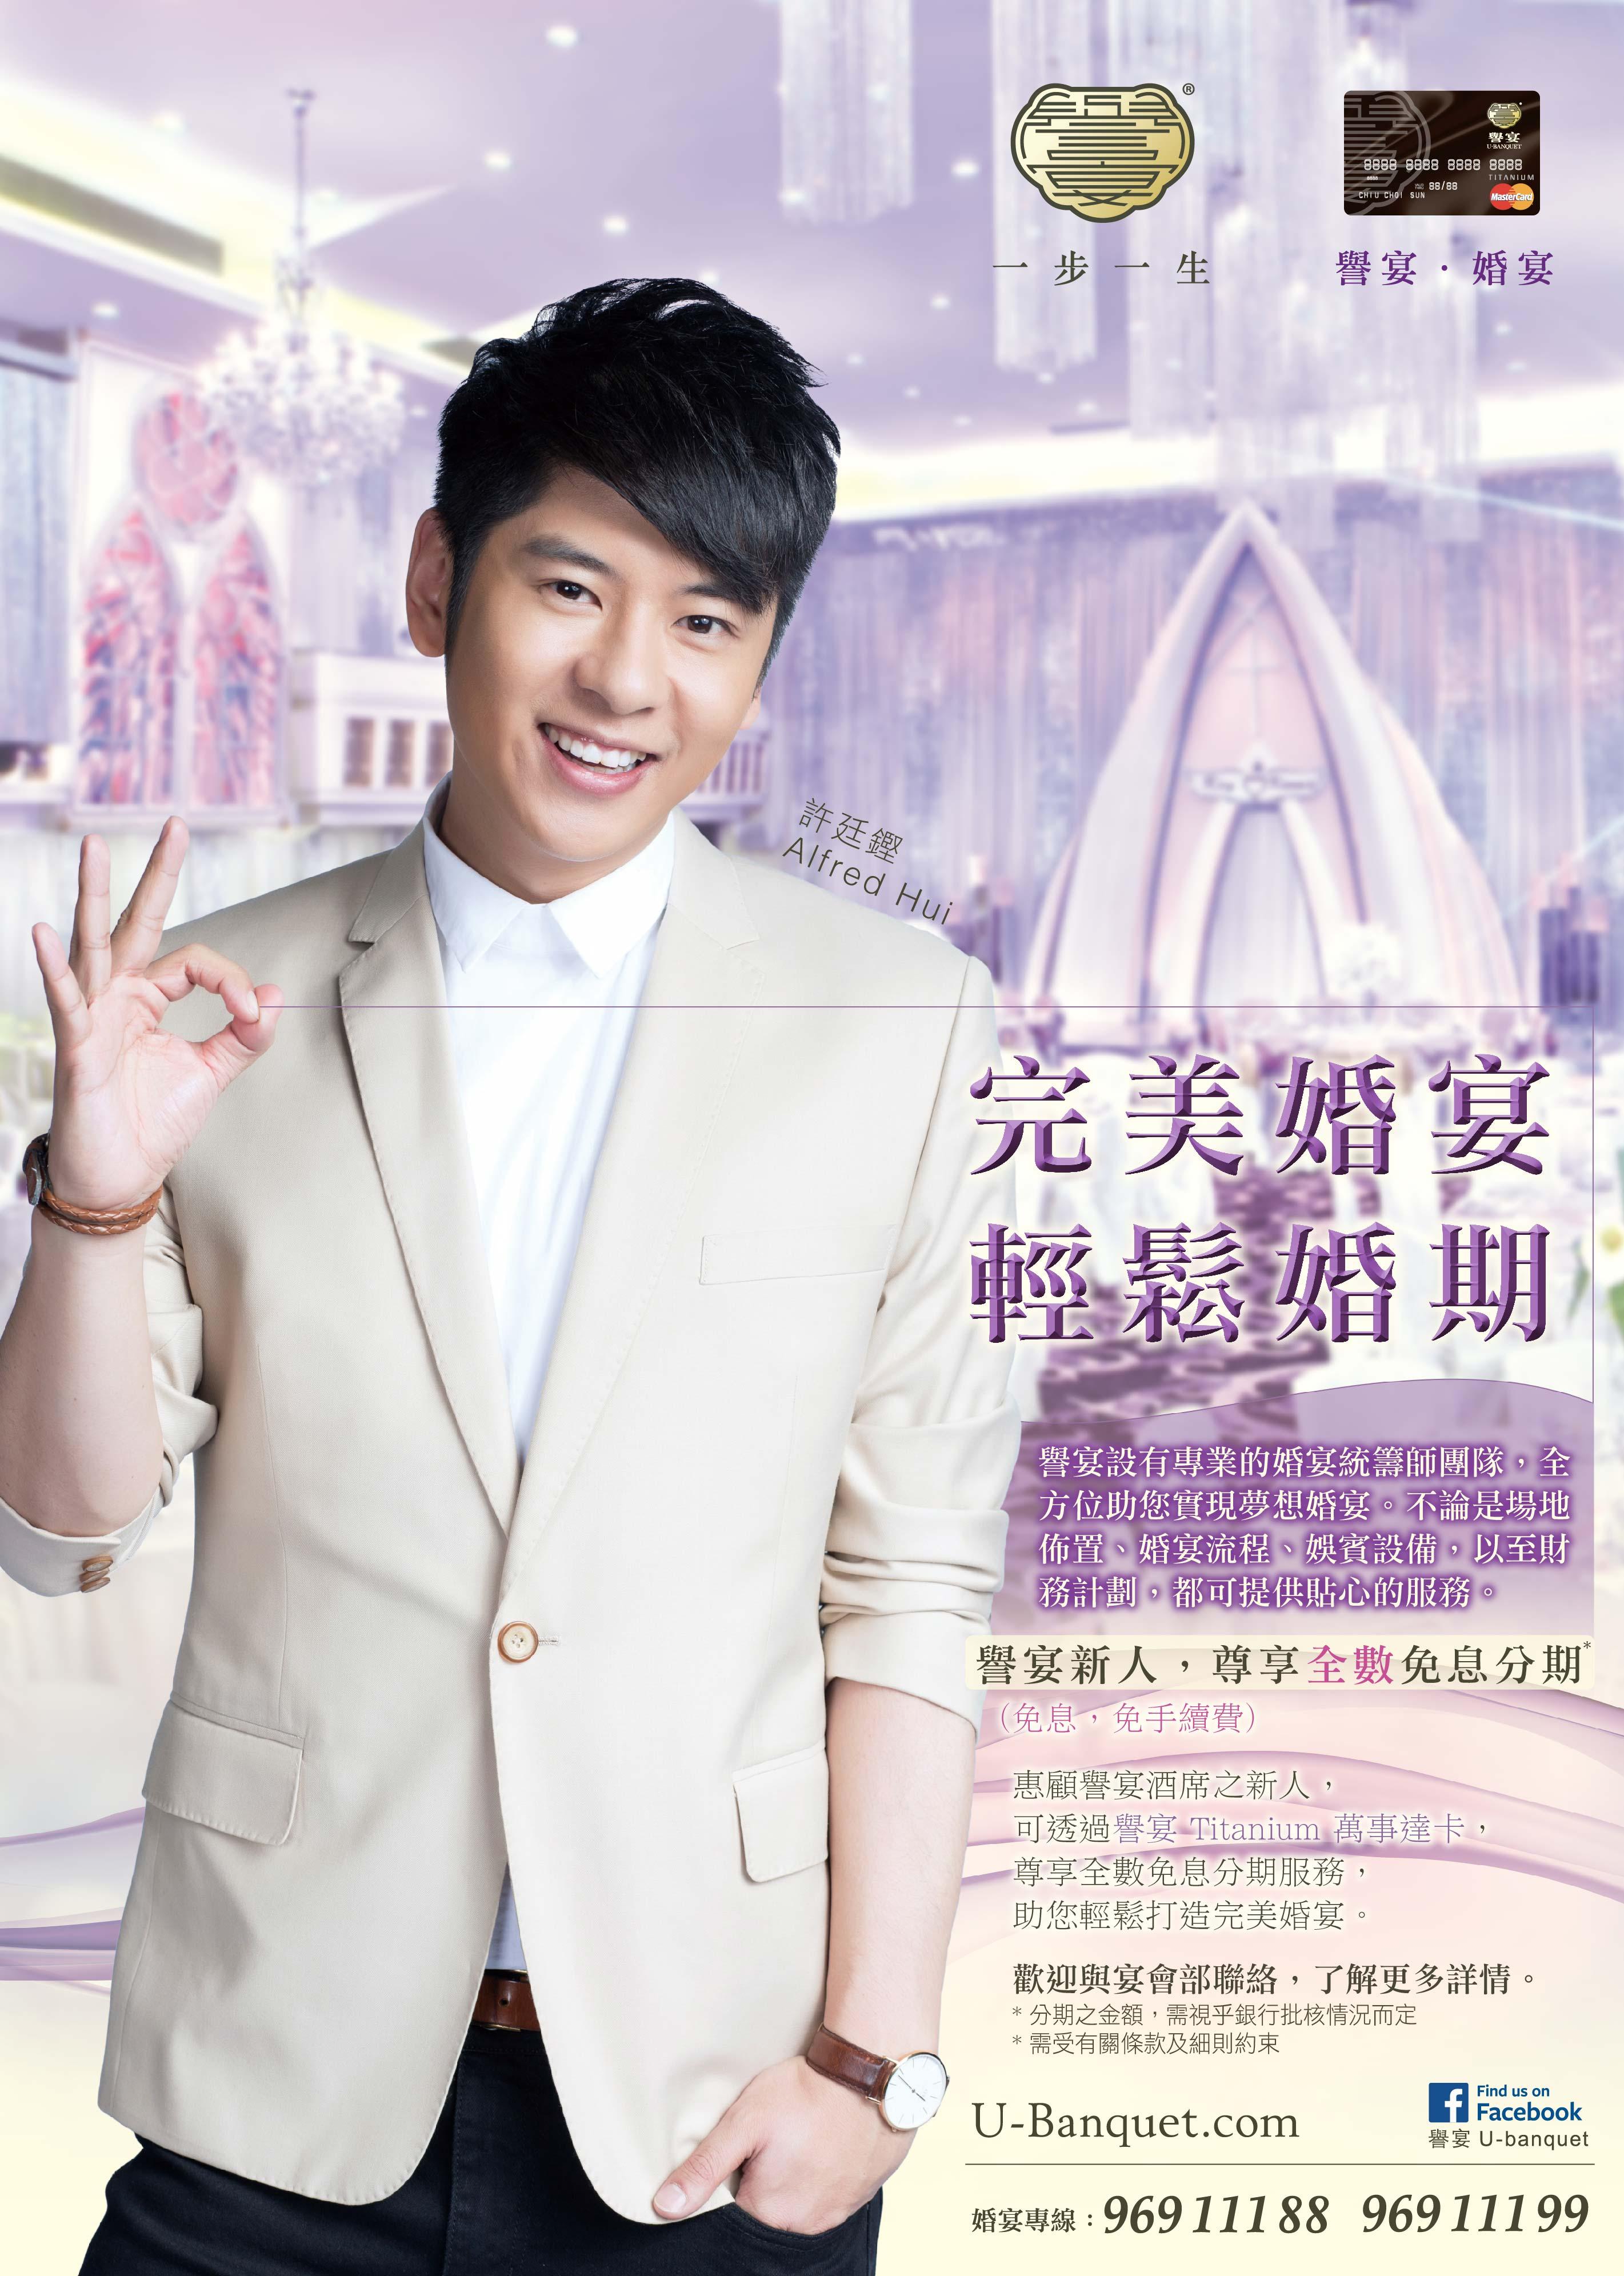 U-Banquet 譽宴 Poster